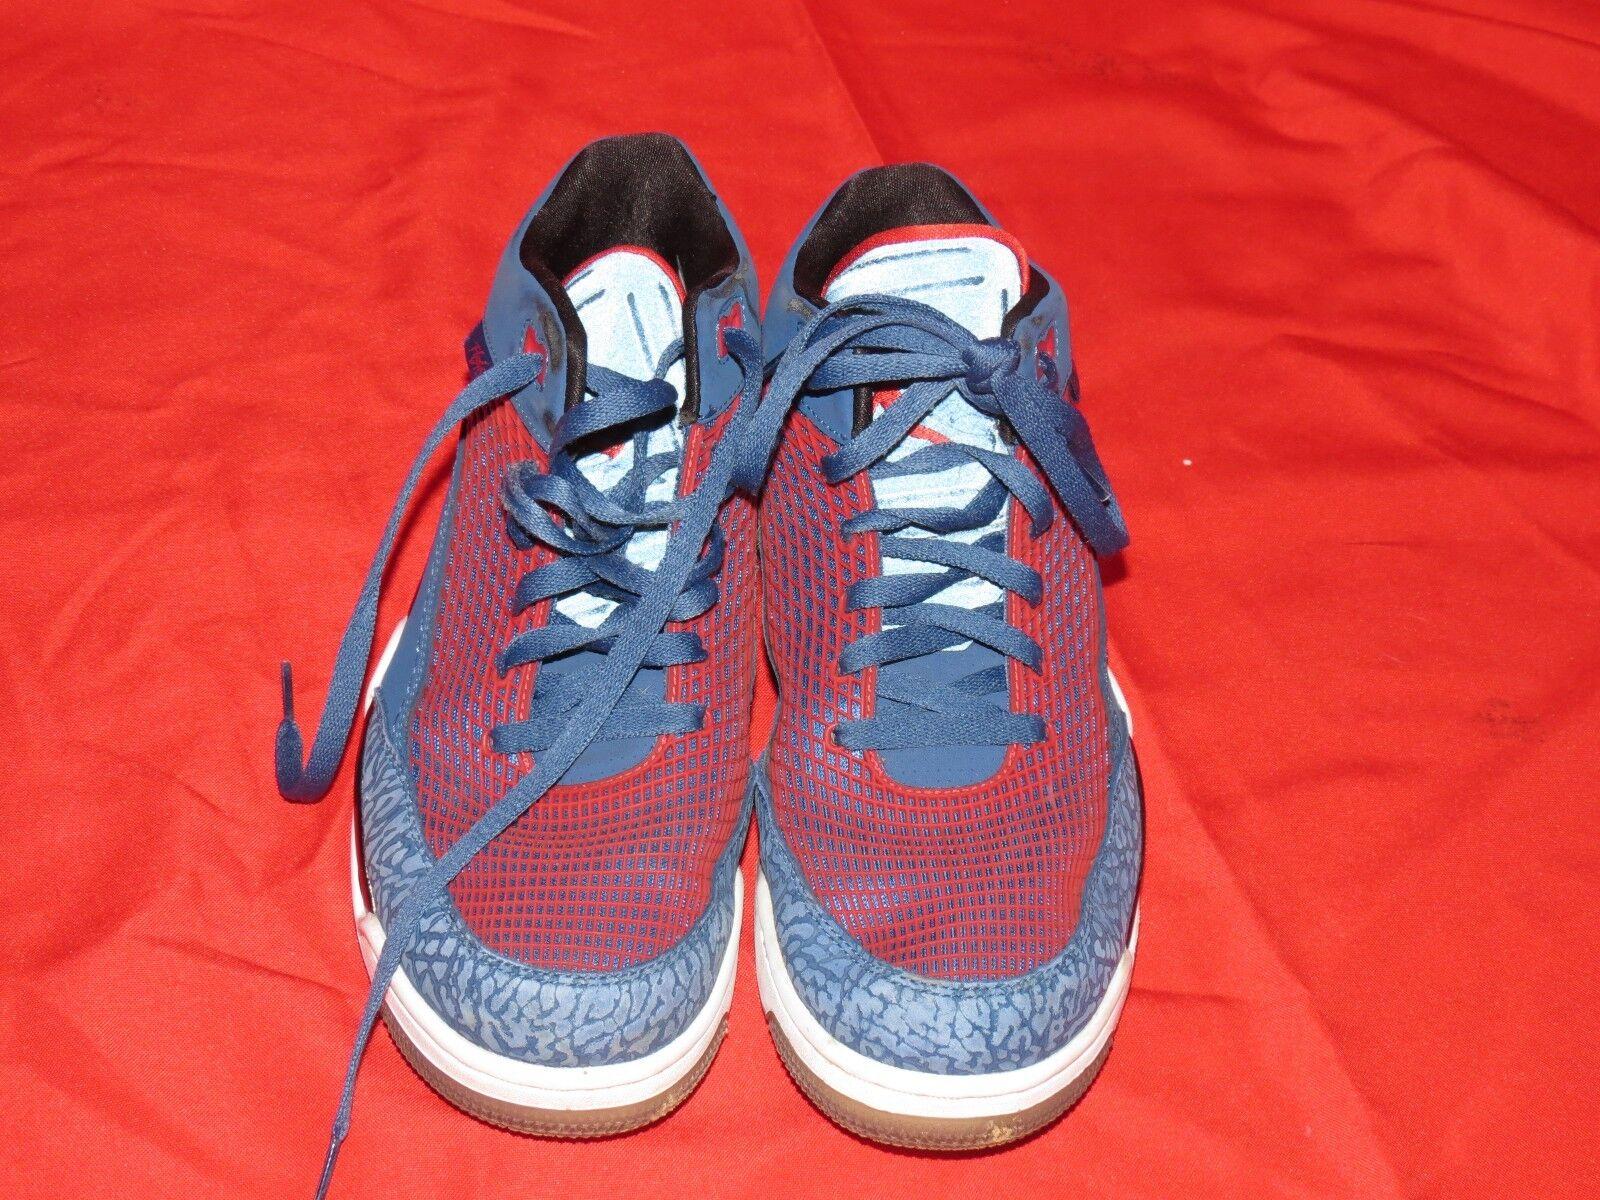 fd12f63d479 Nike 80 Air Jordan Flight Club 80 Nike Mens Basketball Shoes 599583-401  Blue Red